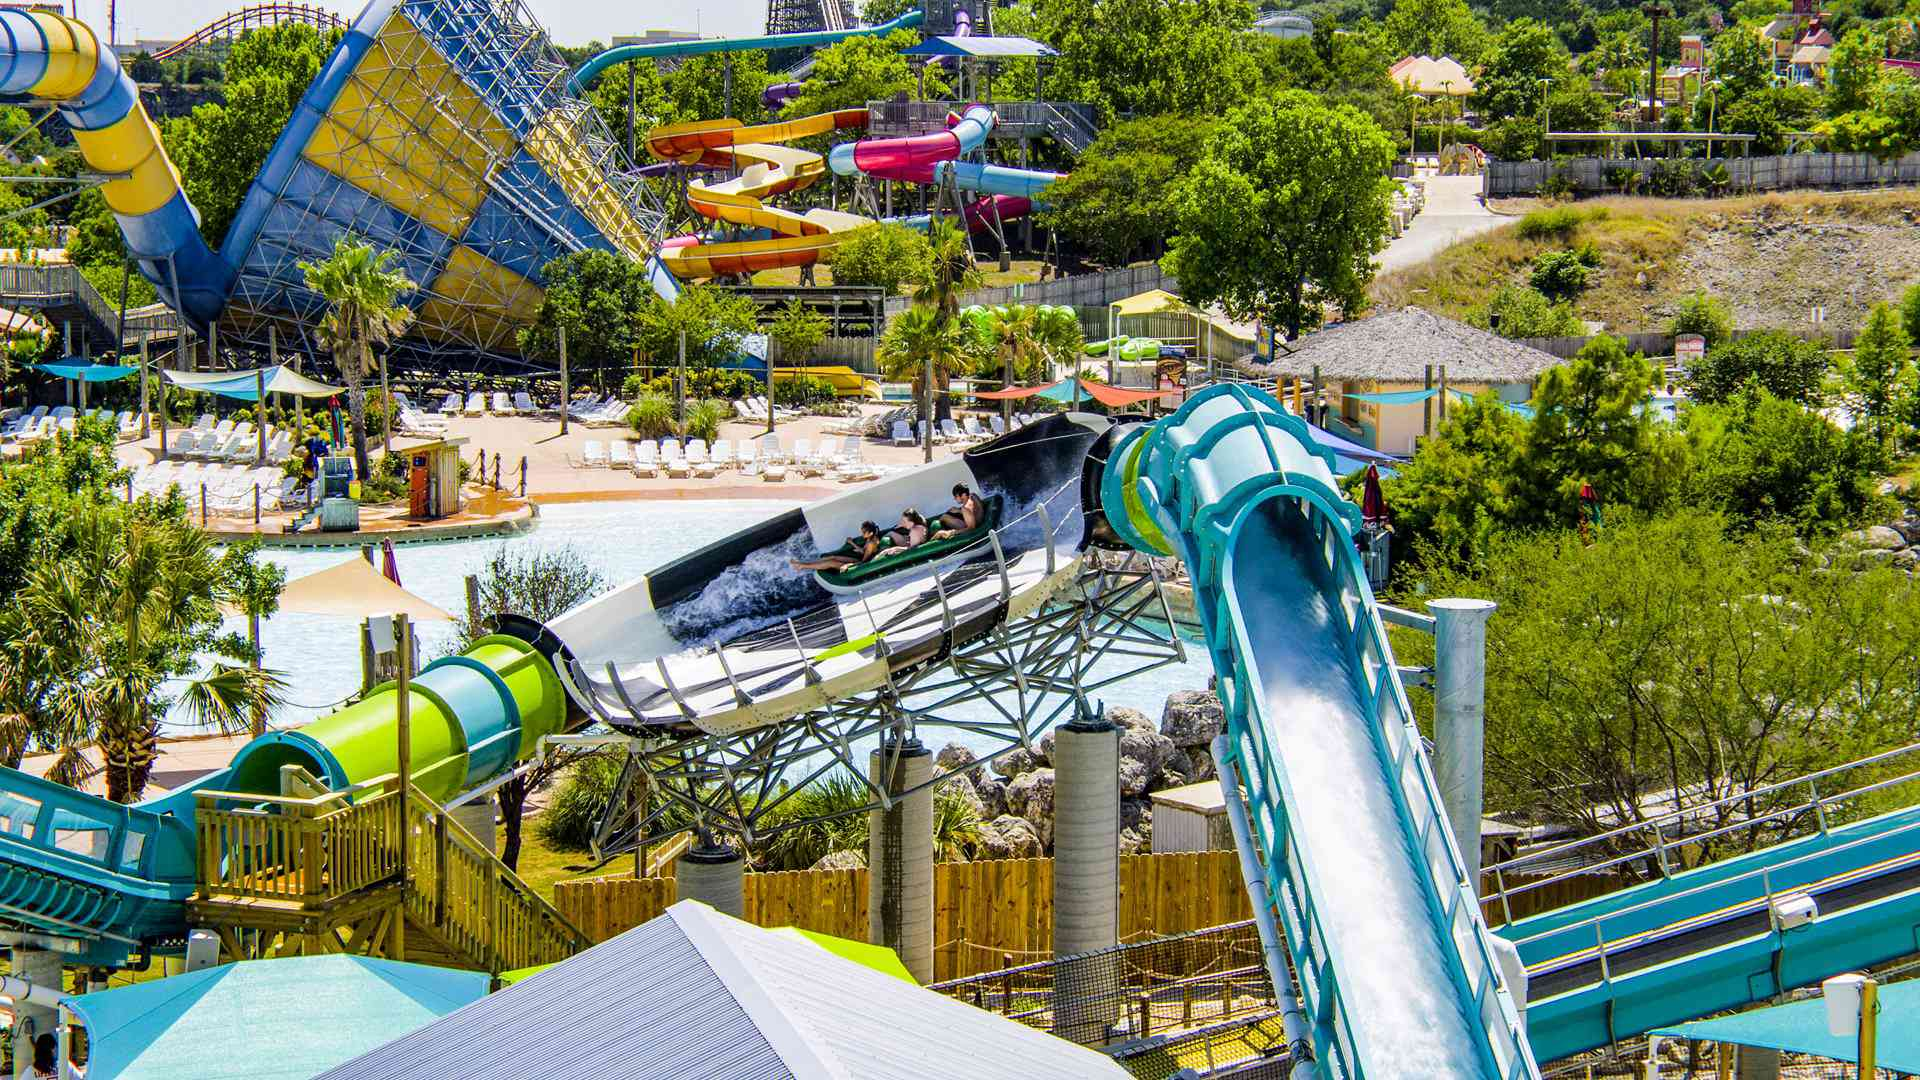 Tsunami Surge water coaster Six Flags Great America